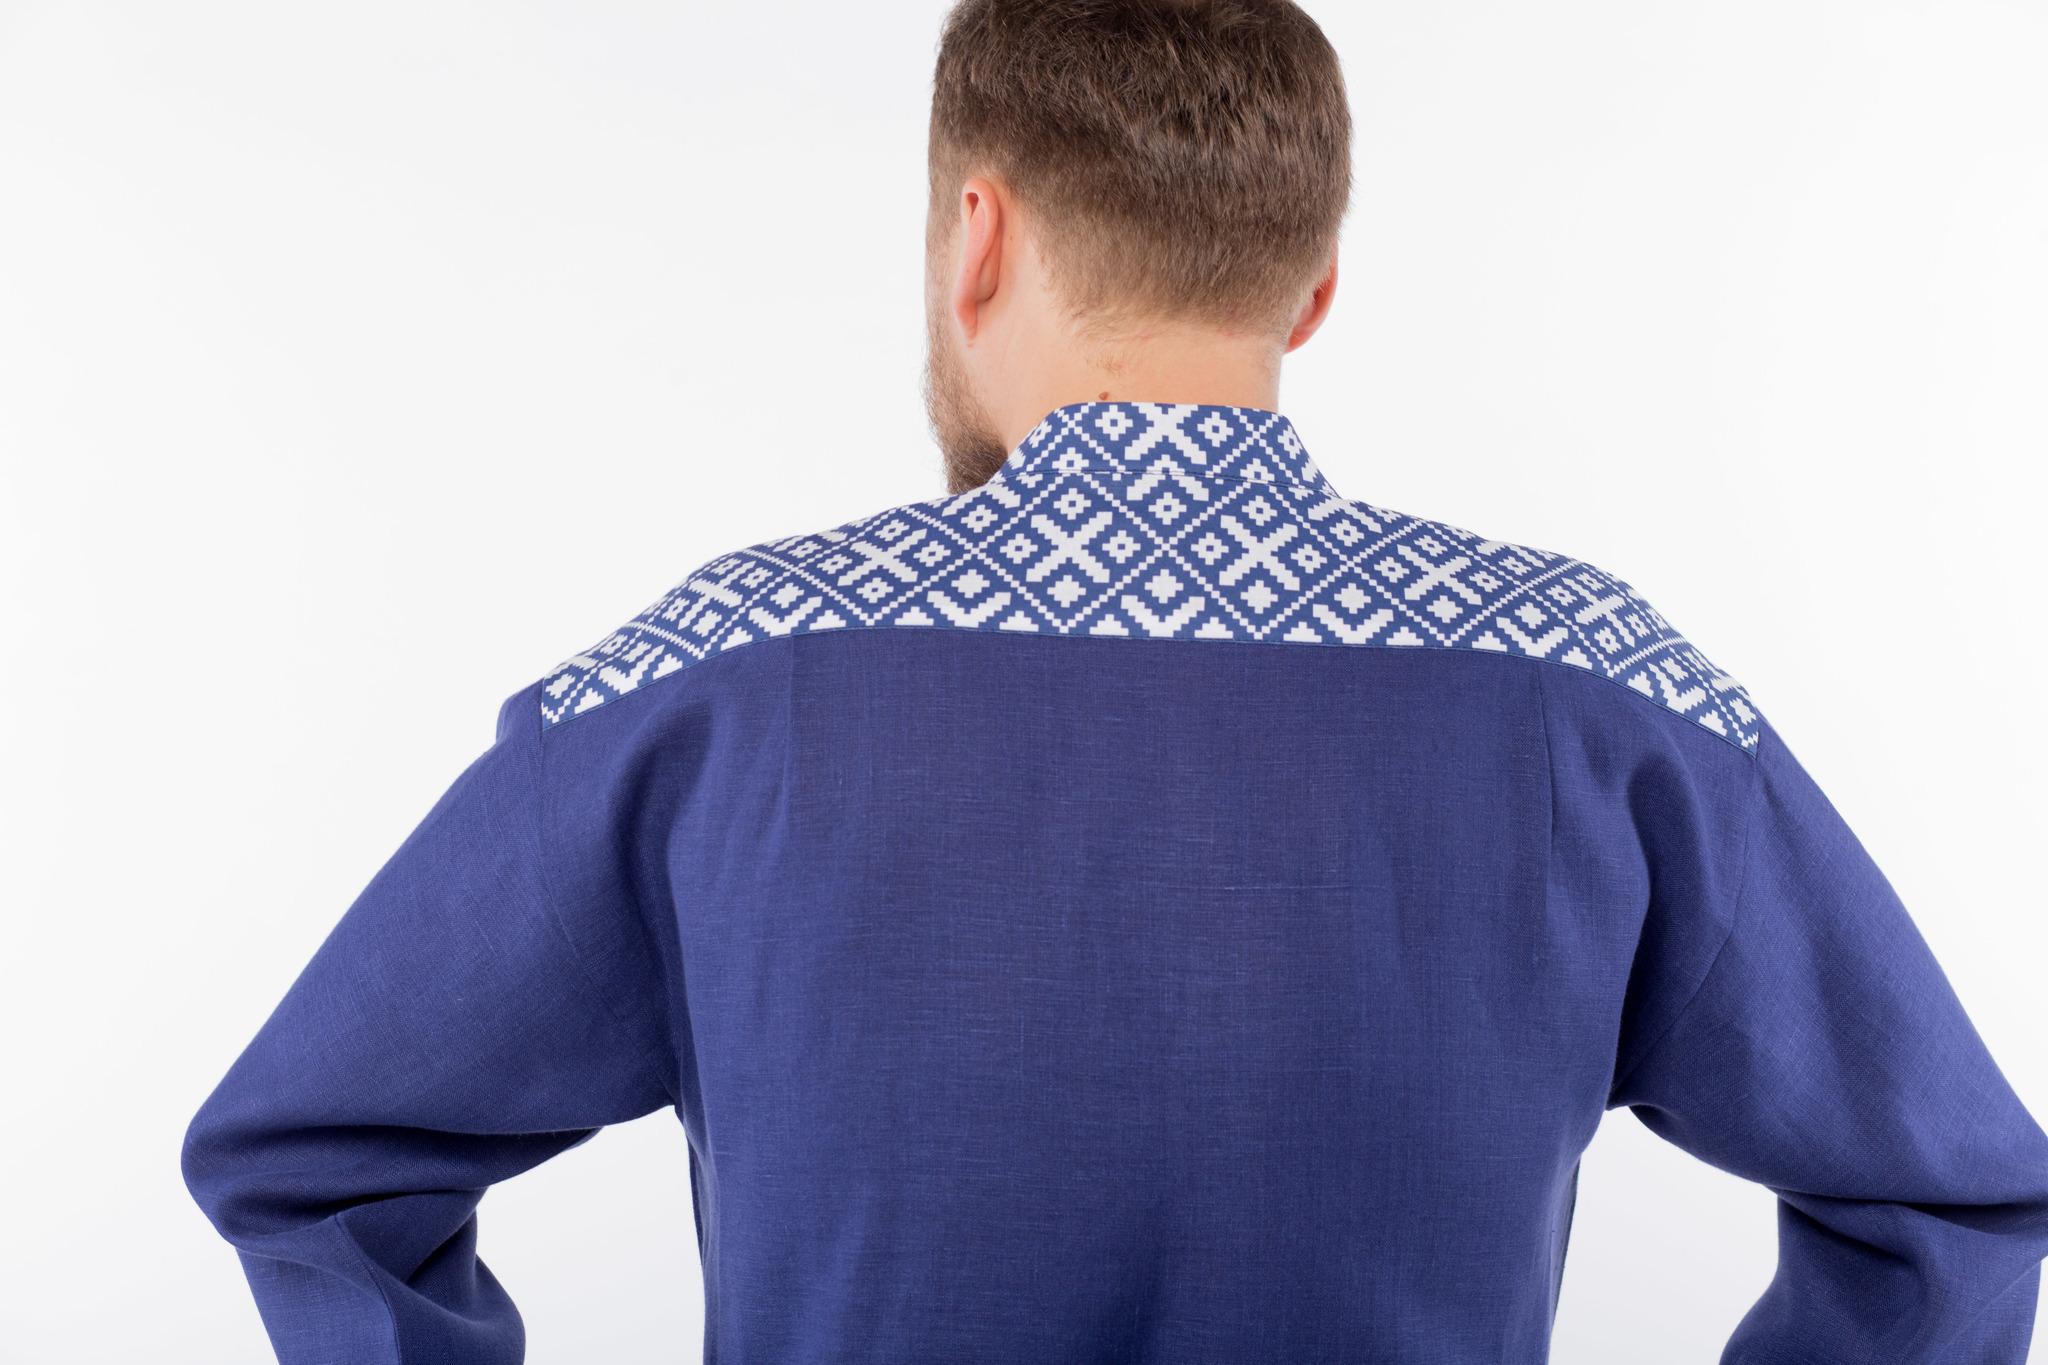 Мужская льняная рубаха Забайкальская кокетка спинки